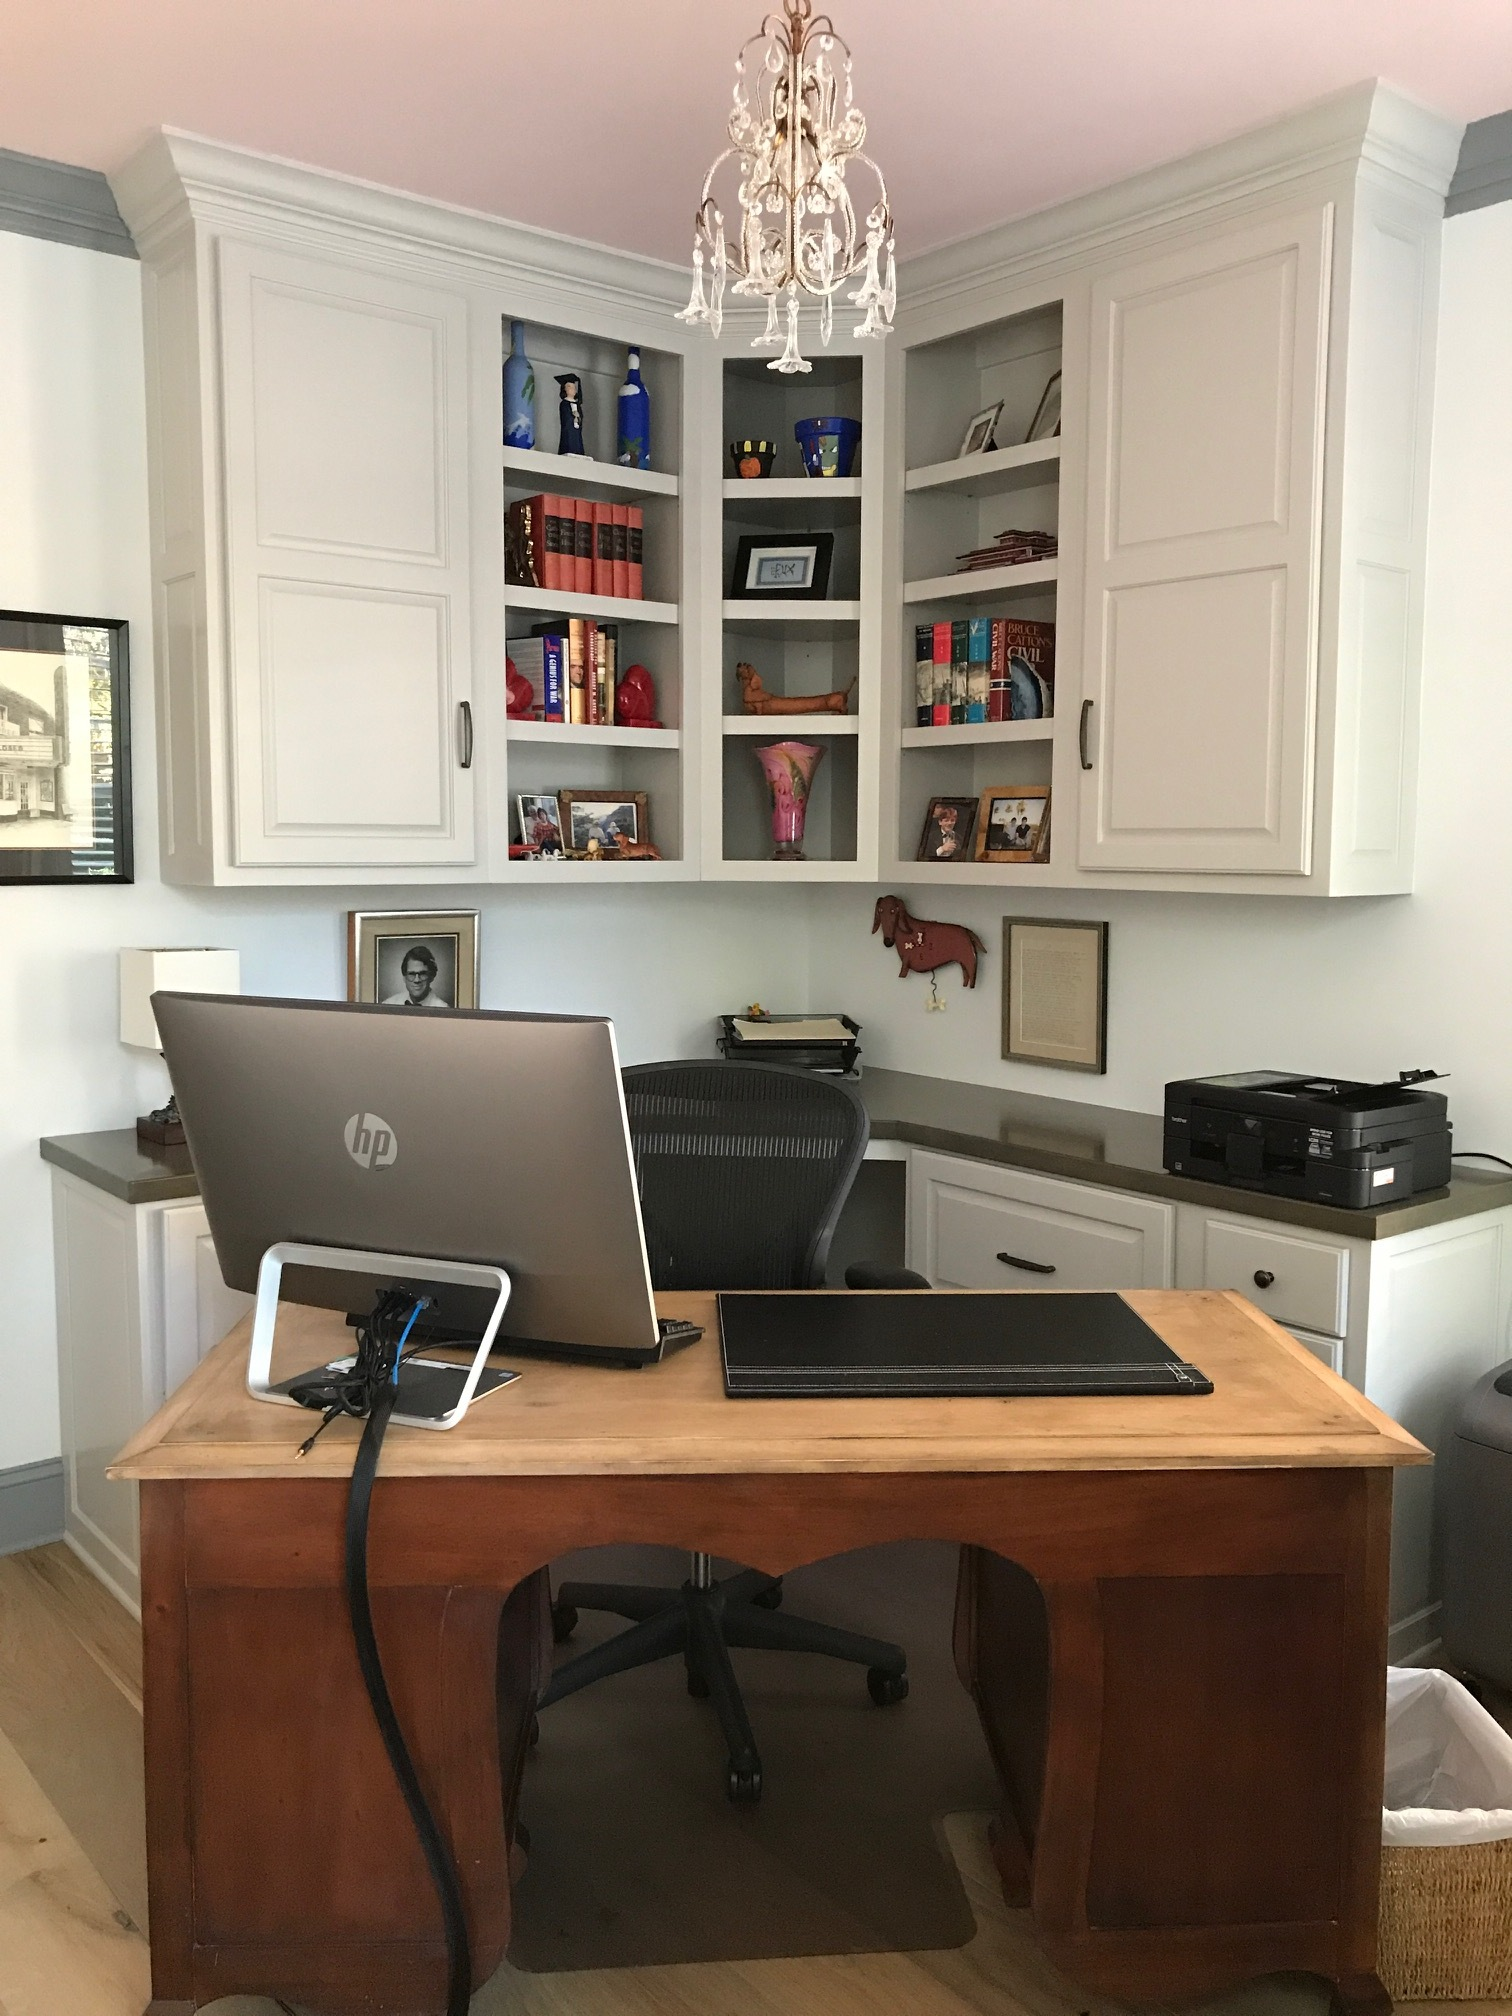 Custom Built-in Corner Desk with Raised Panel Doors, Adjustable Shelves & Stain Countertop